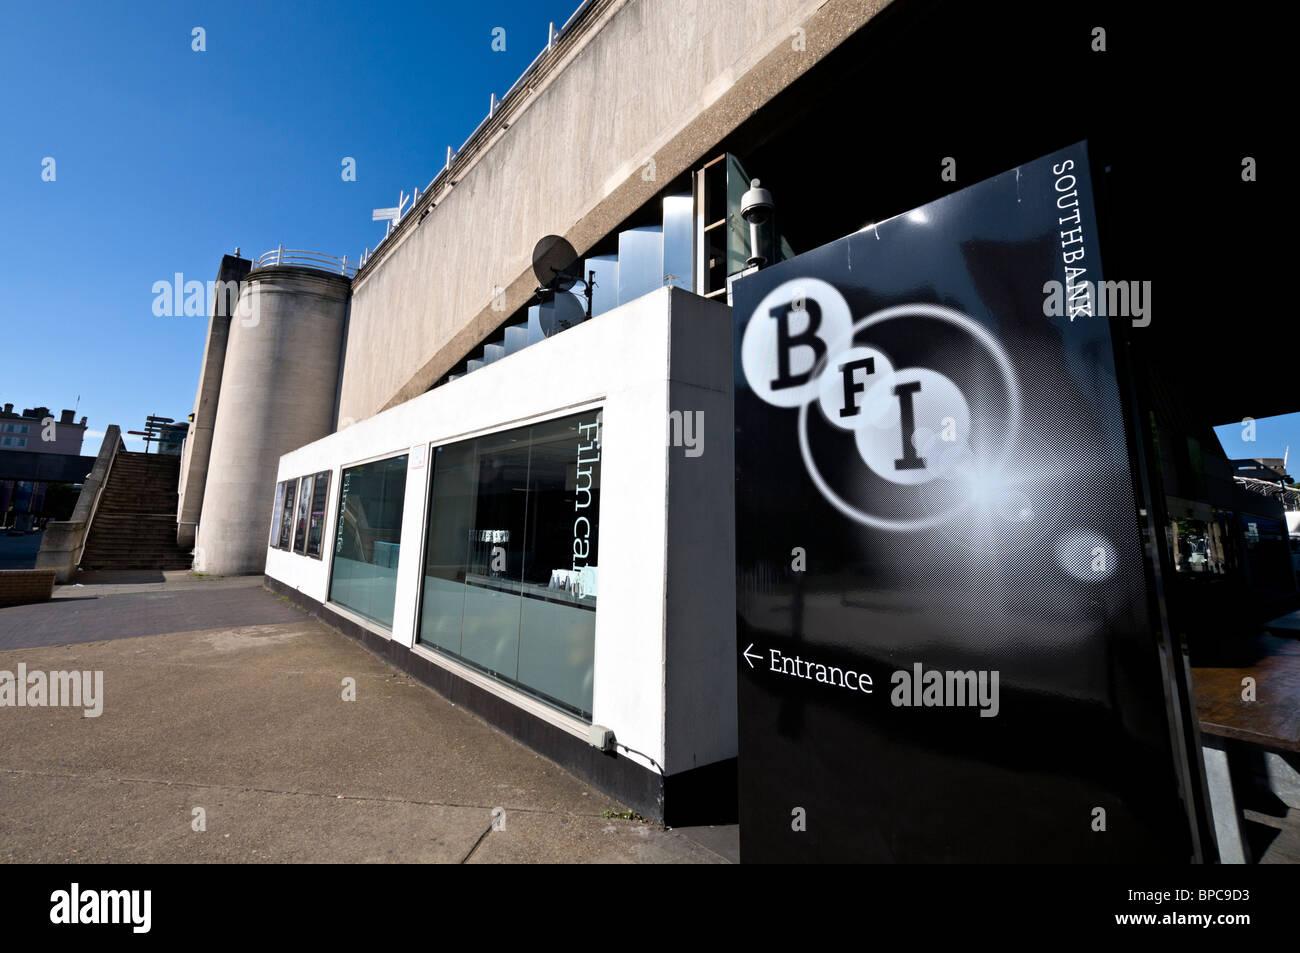 South Bank BFI entrance - Stock Image